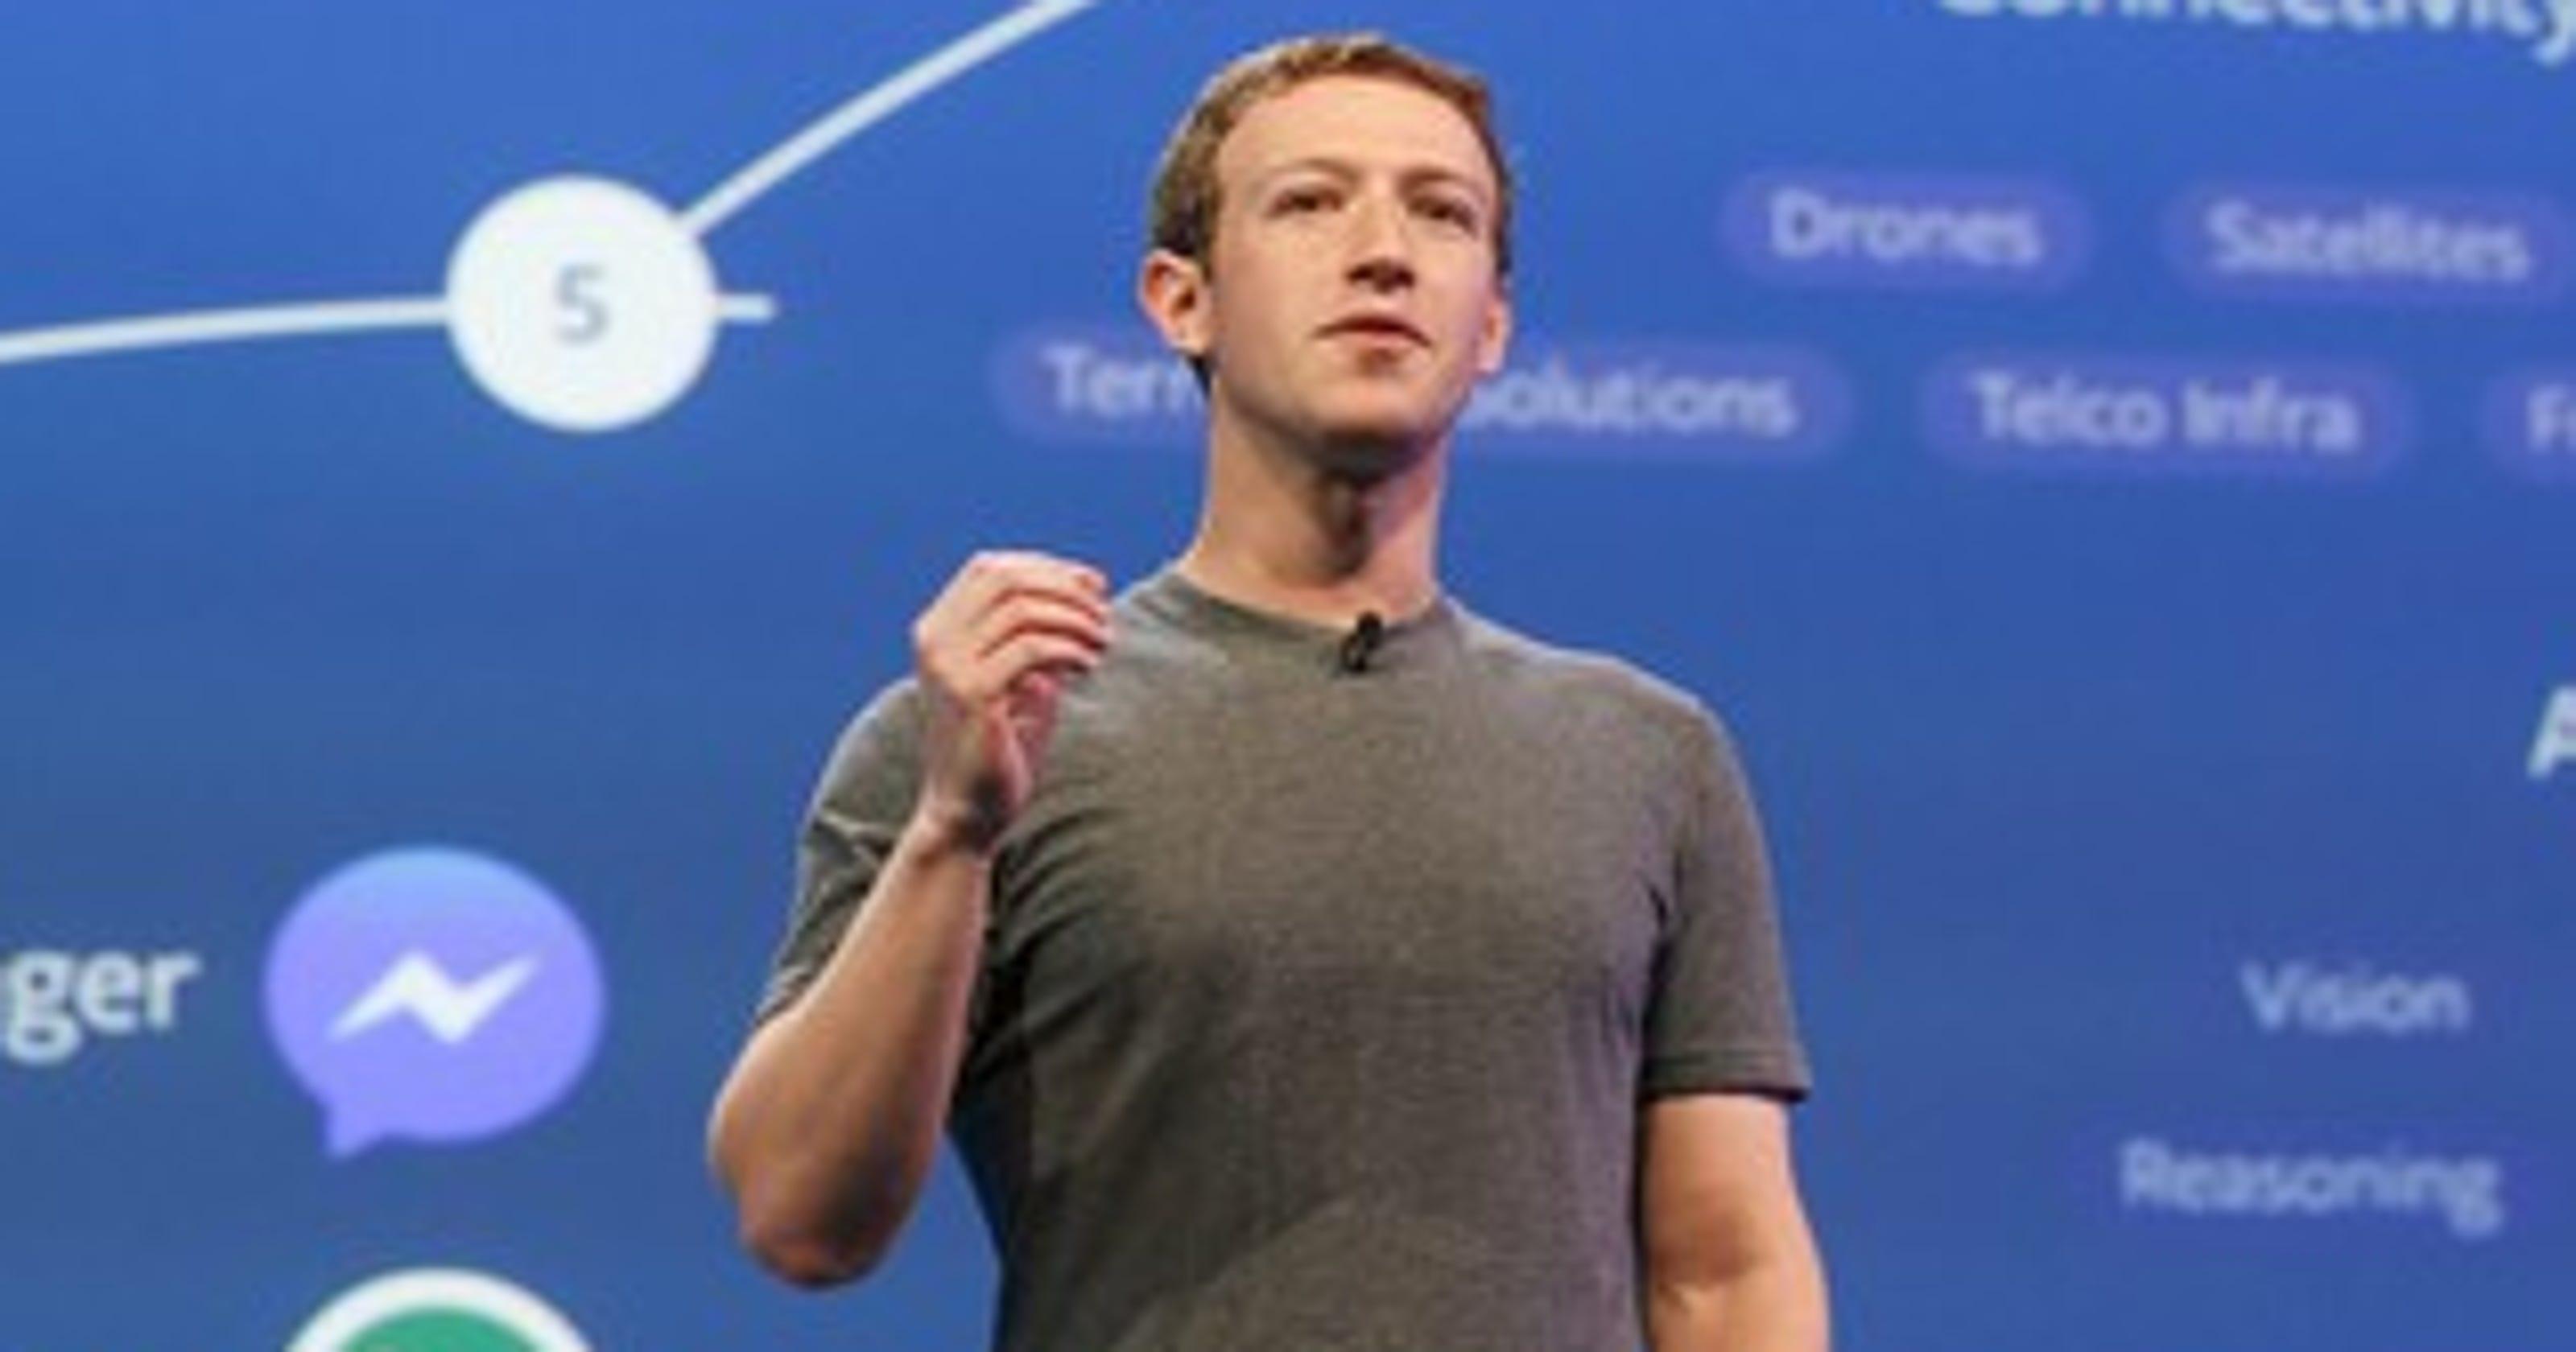 Facebook paid over $8 8 million for Mark Zuckerberg's